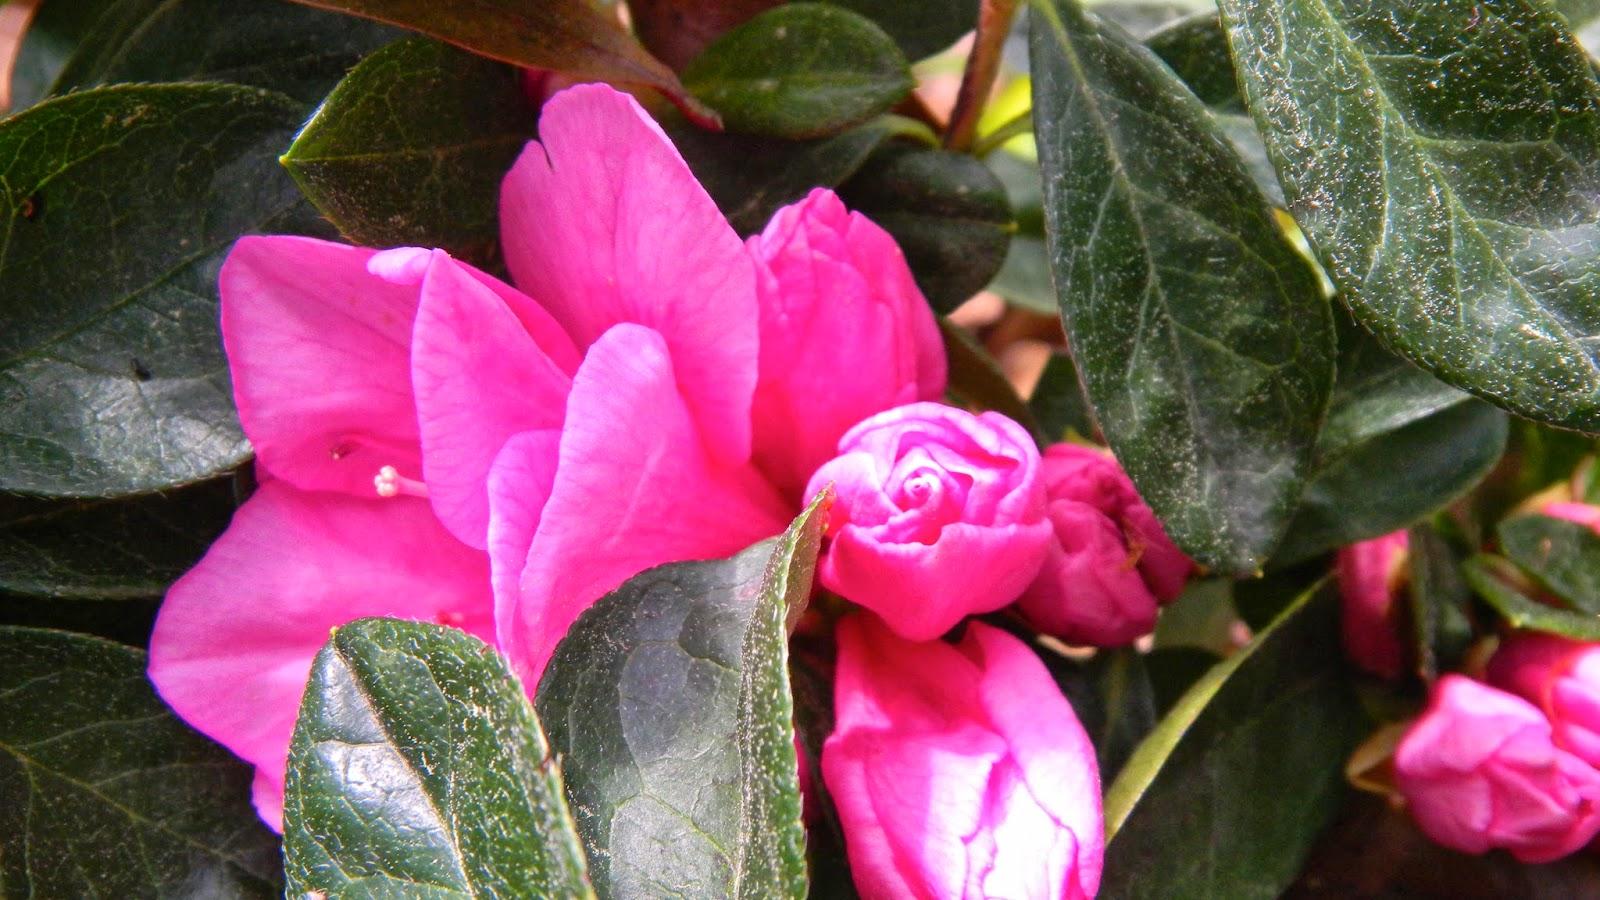 Pink Ruffles azalea